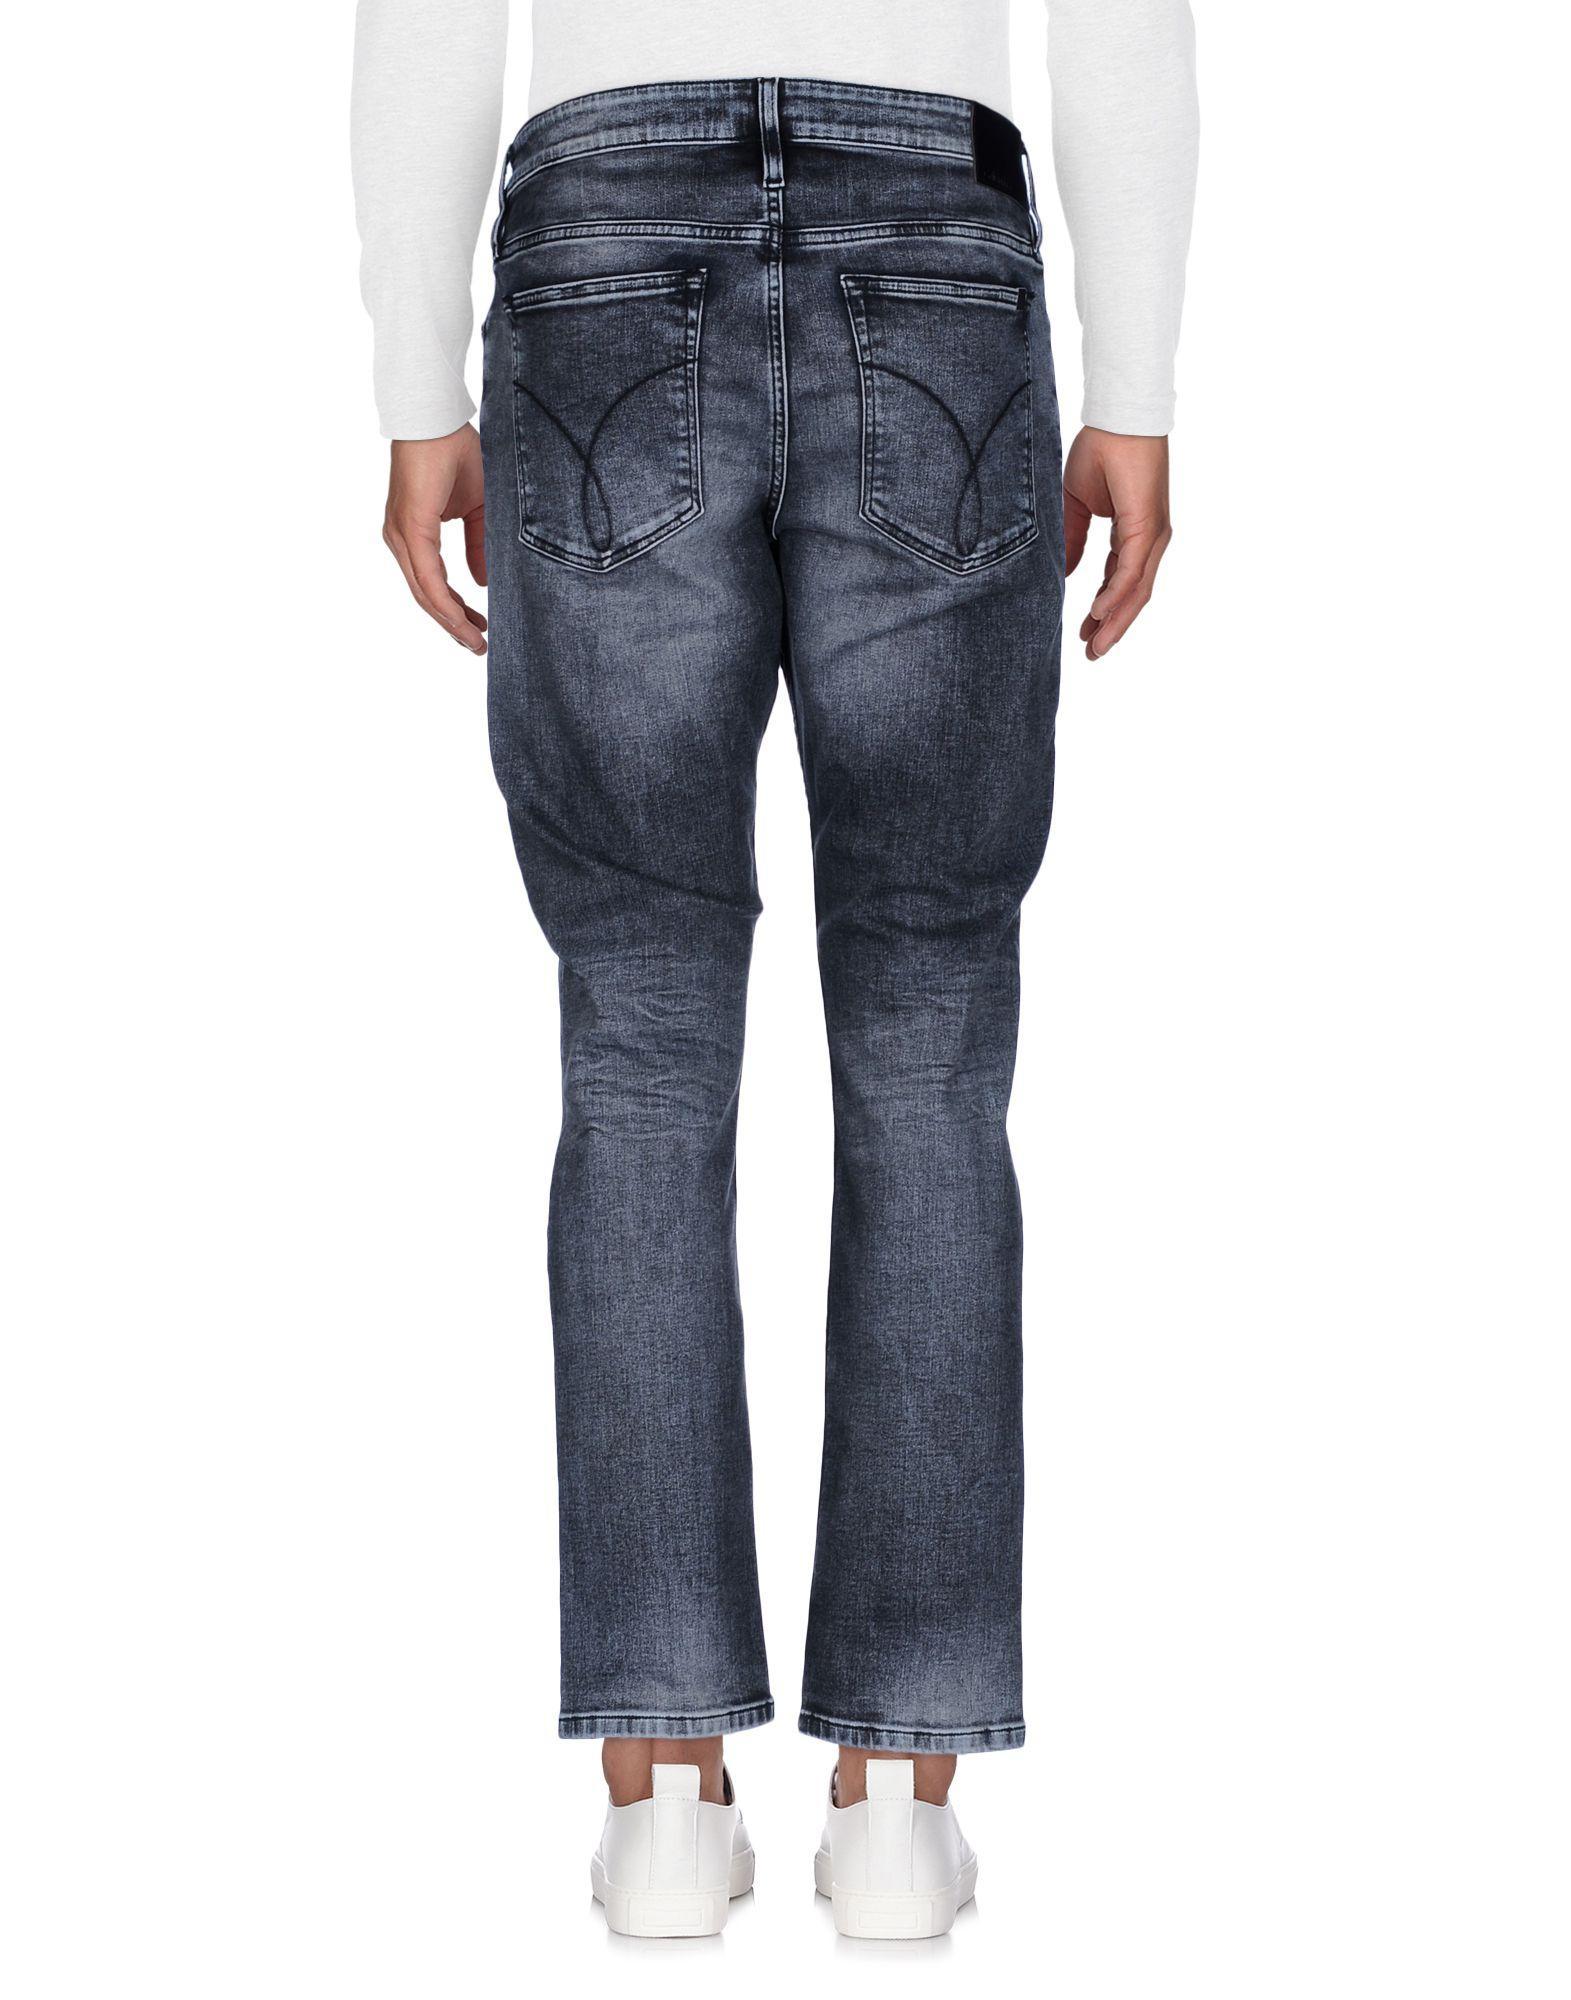 Calvin Klein Jeans Denim Pants In Black For Men Lyst